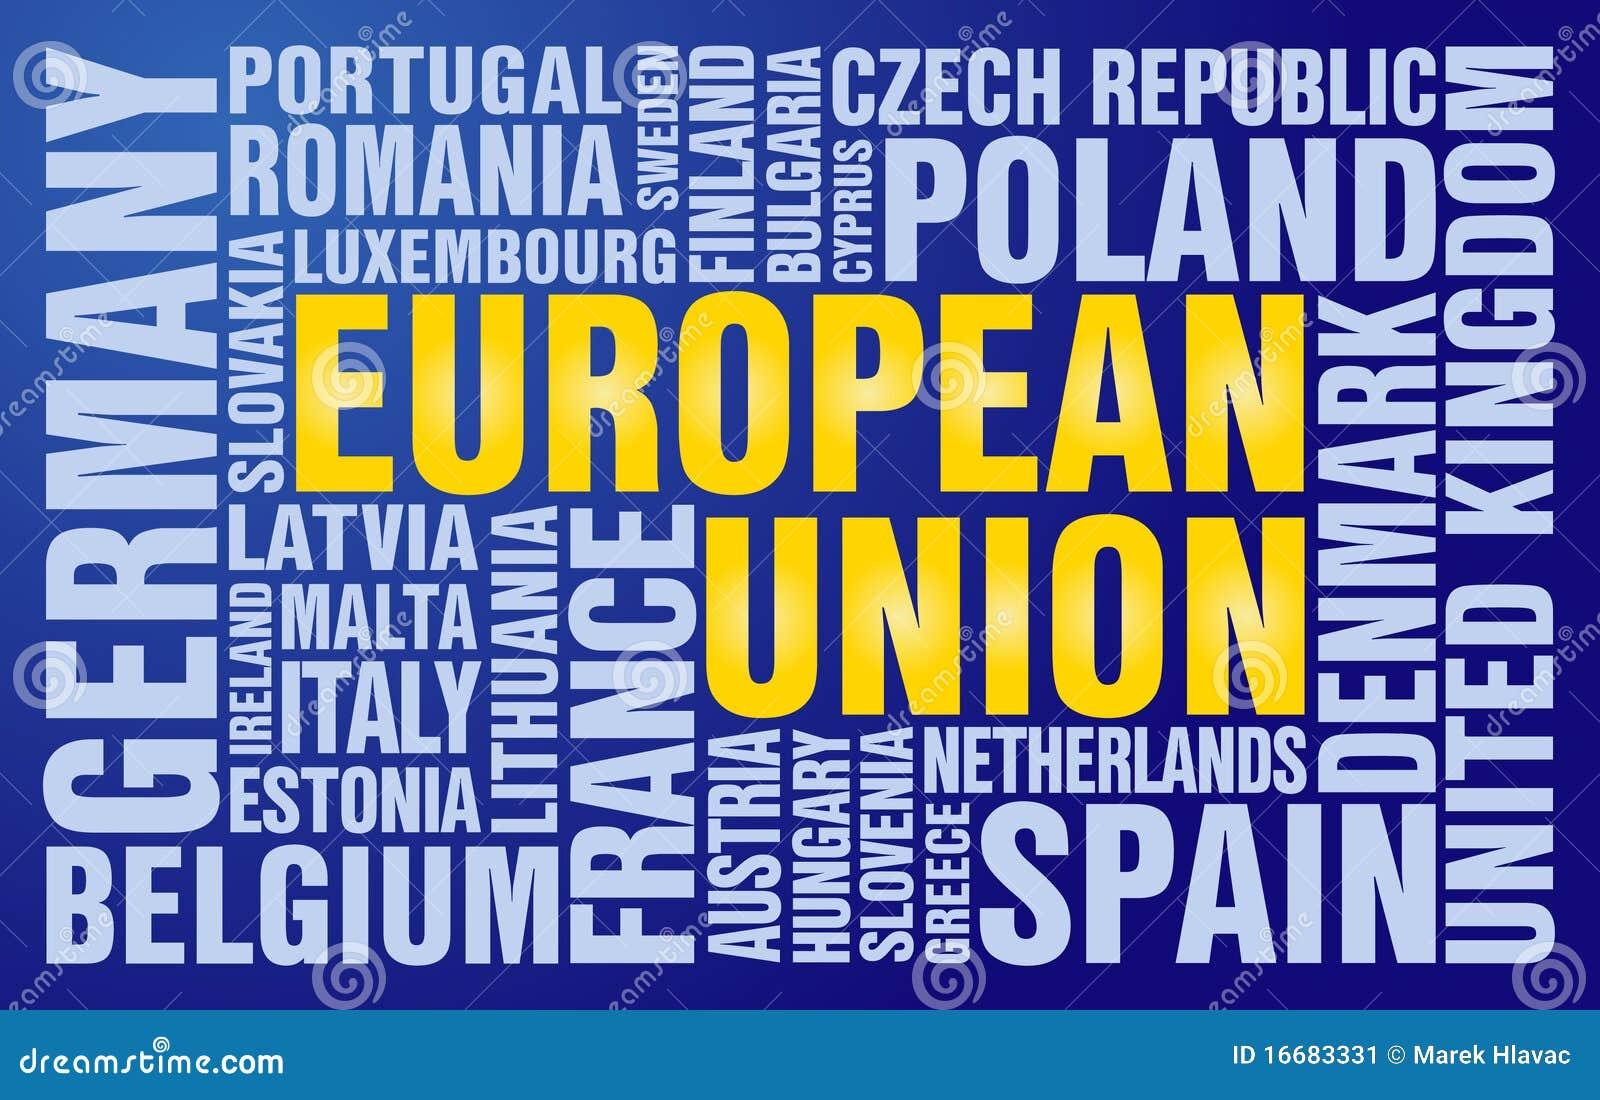 Het raadsel van de Europese Unie